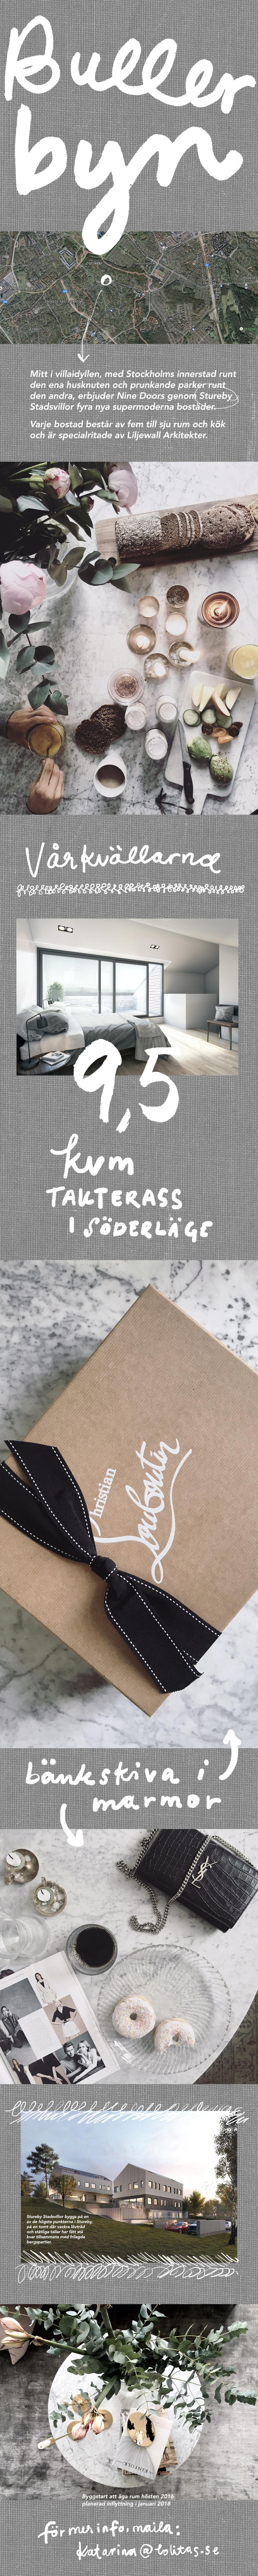 stureby-stadsvillor-nine-door-properties-liljewall-arkitekter-till-salu-stockholm